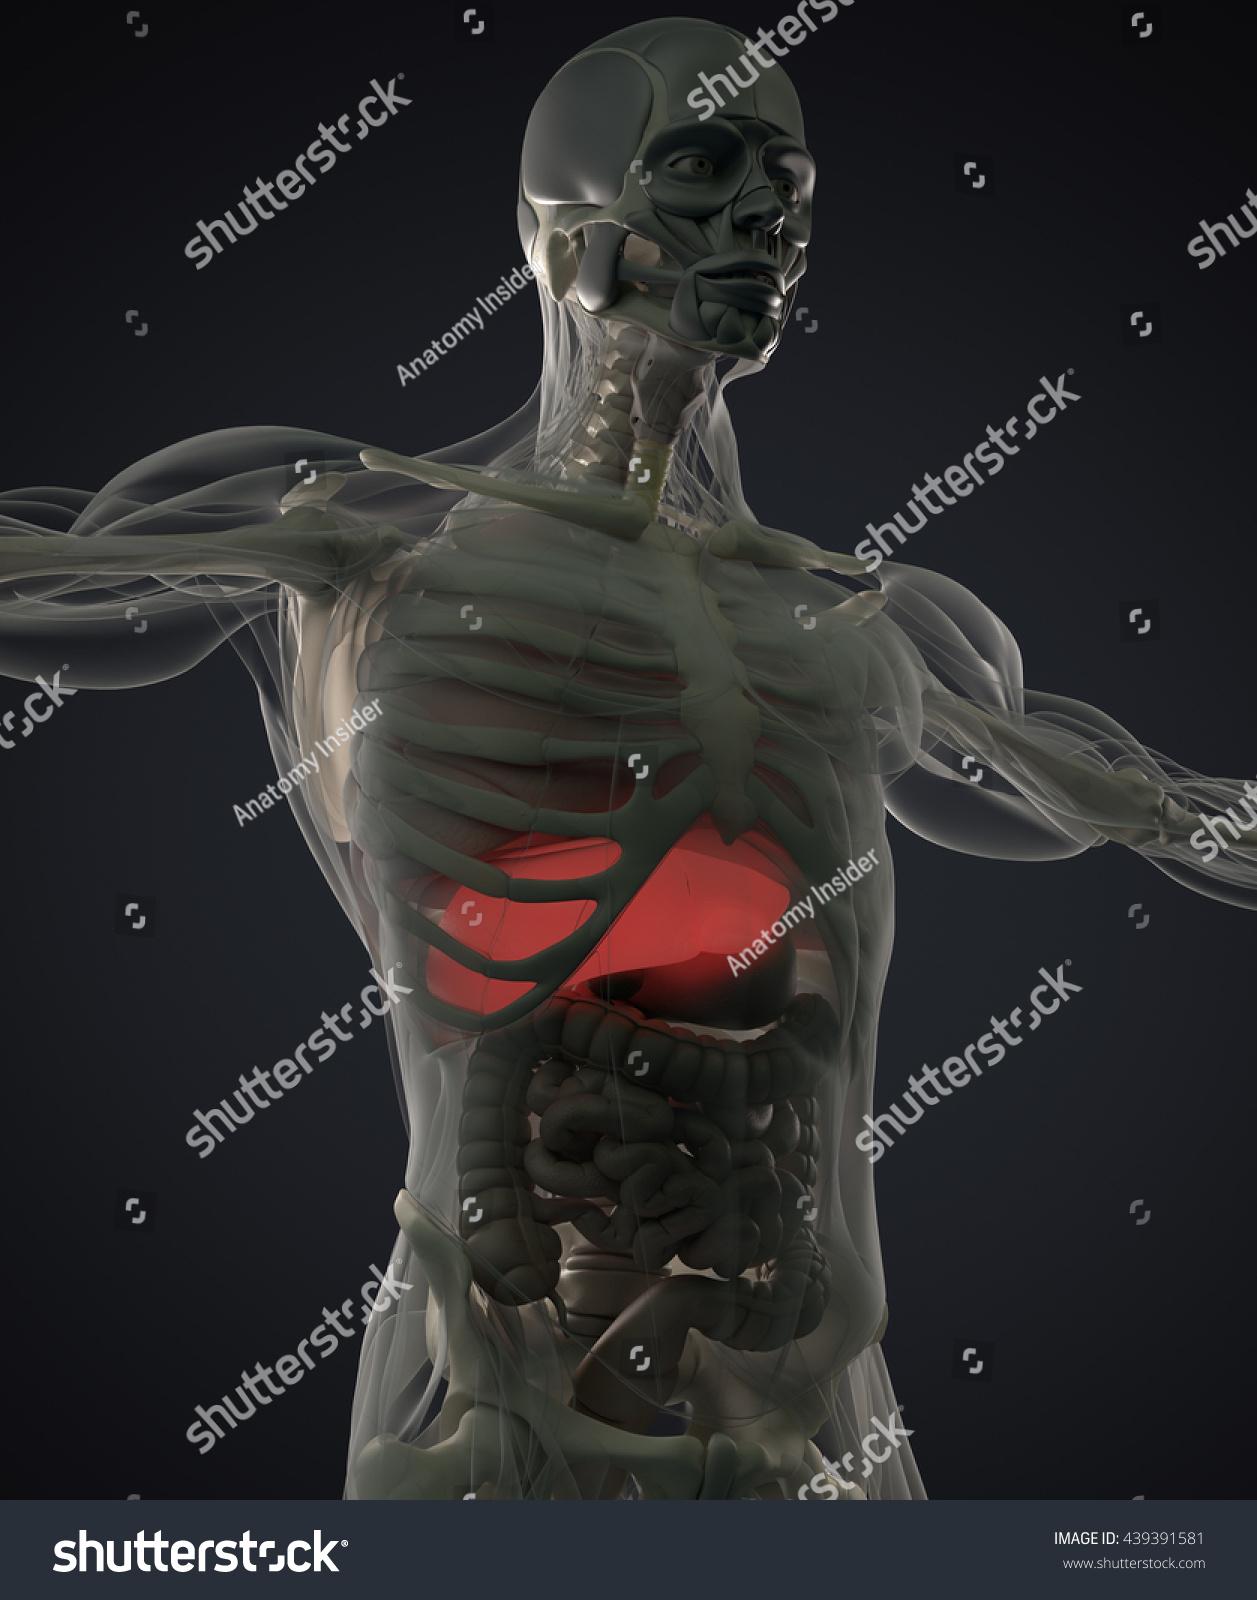 Human Anatomy Liver Xray Like View Stock Illustration 439391581